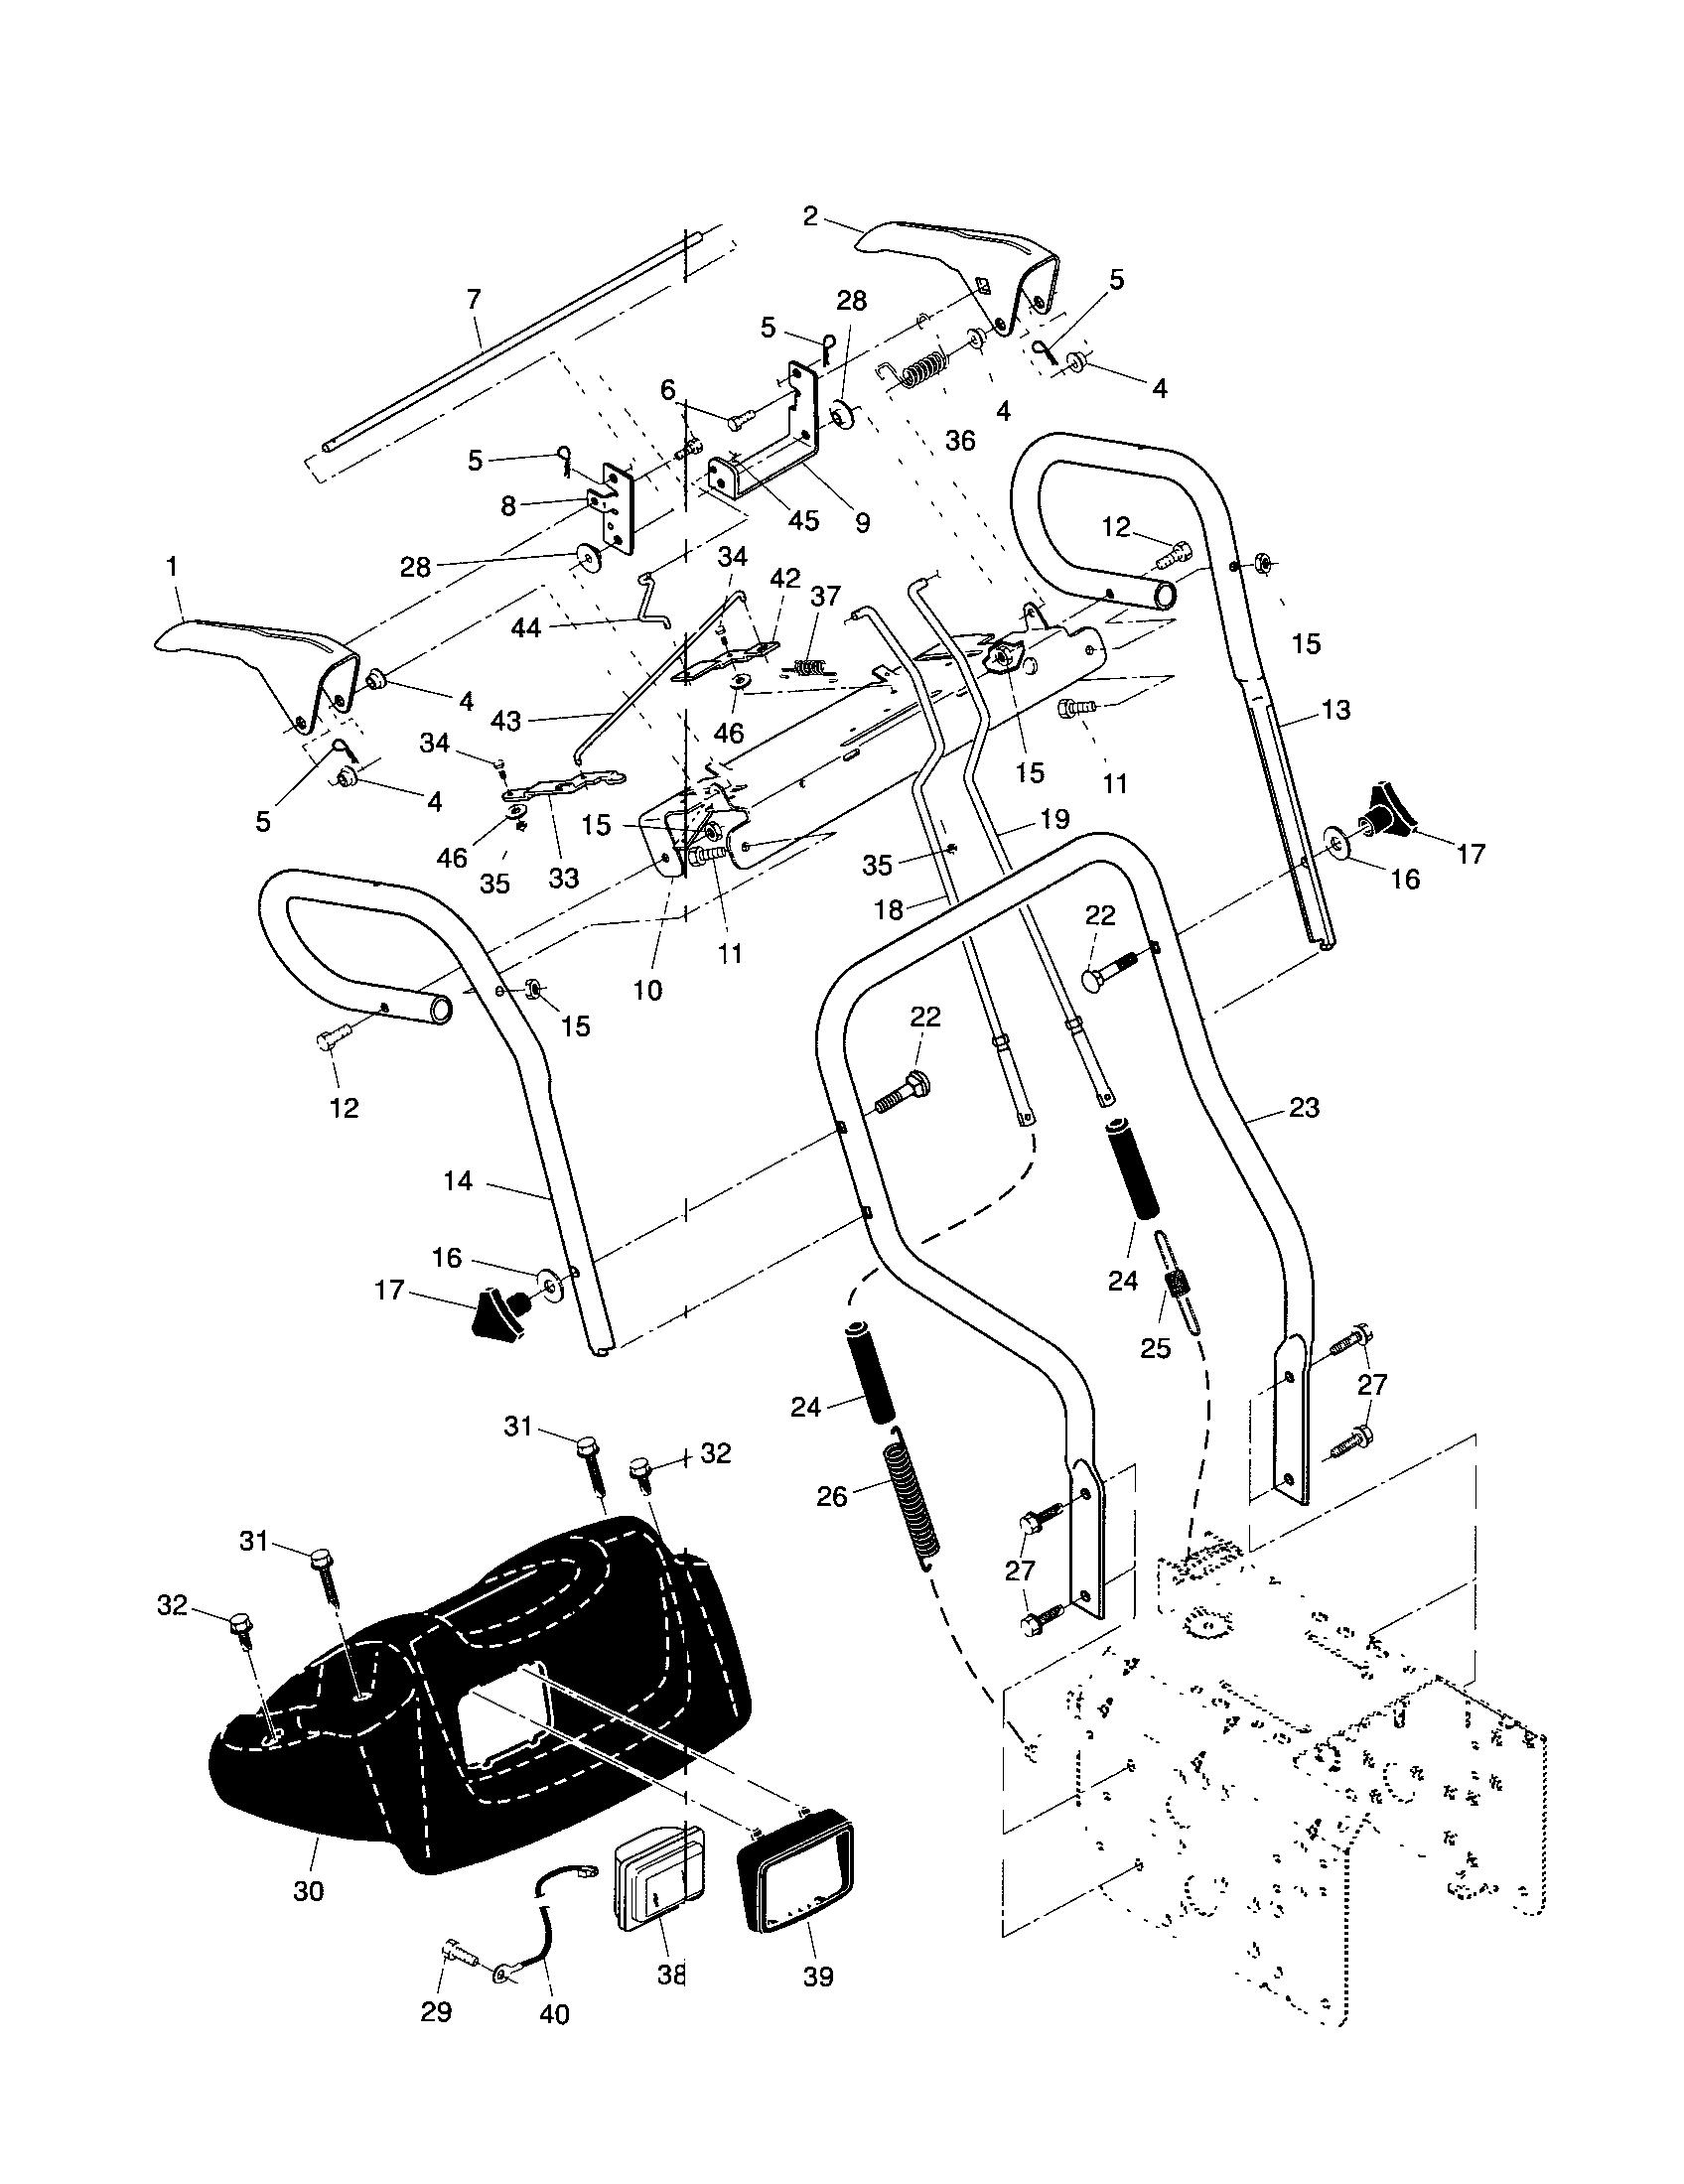 HANDLES Diagram & Parts List for Model 917885530 Craftsman